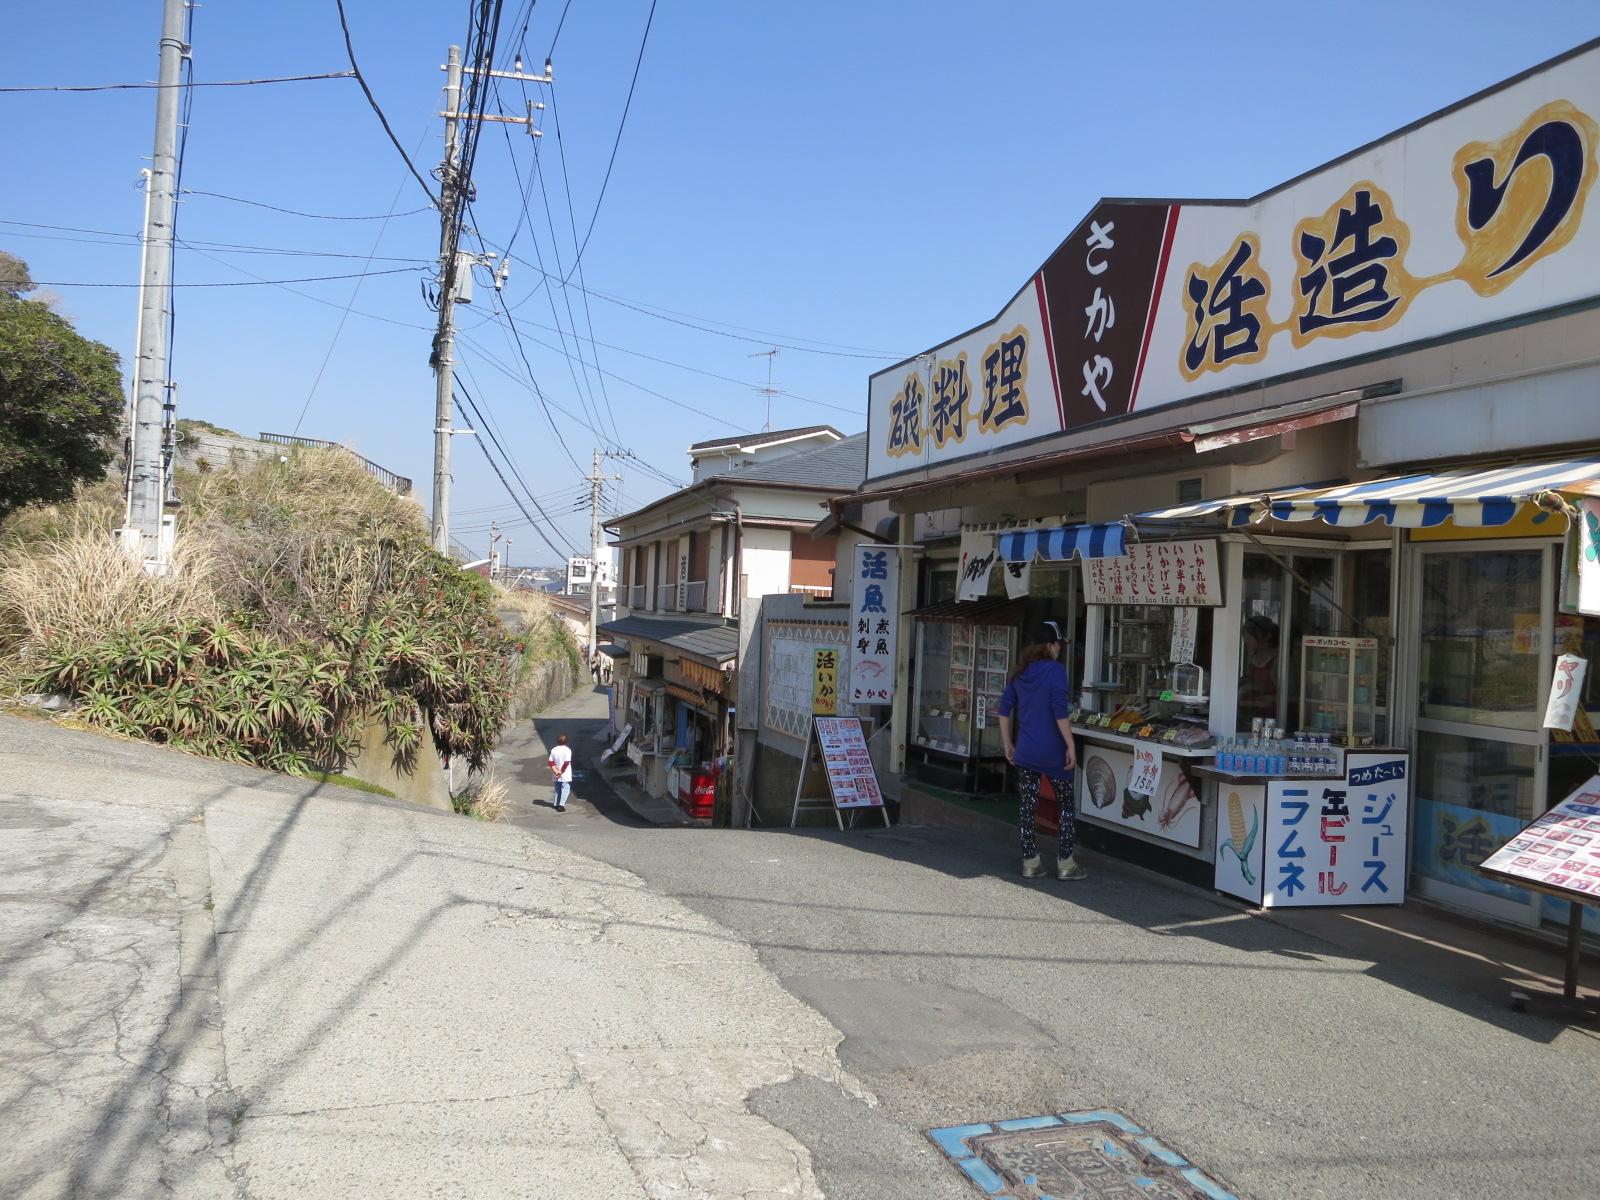 Japan concierge 39 s travelog tuna auction at misaki port for Asian cuisine ocean view nj